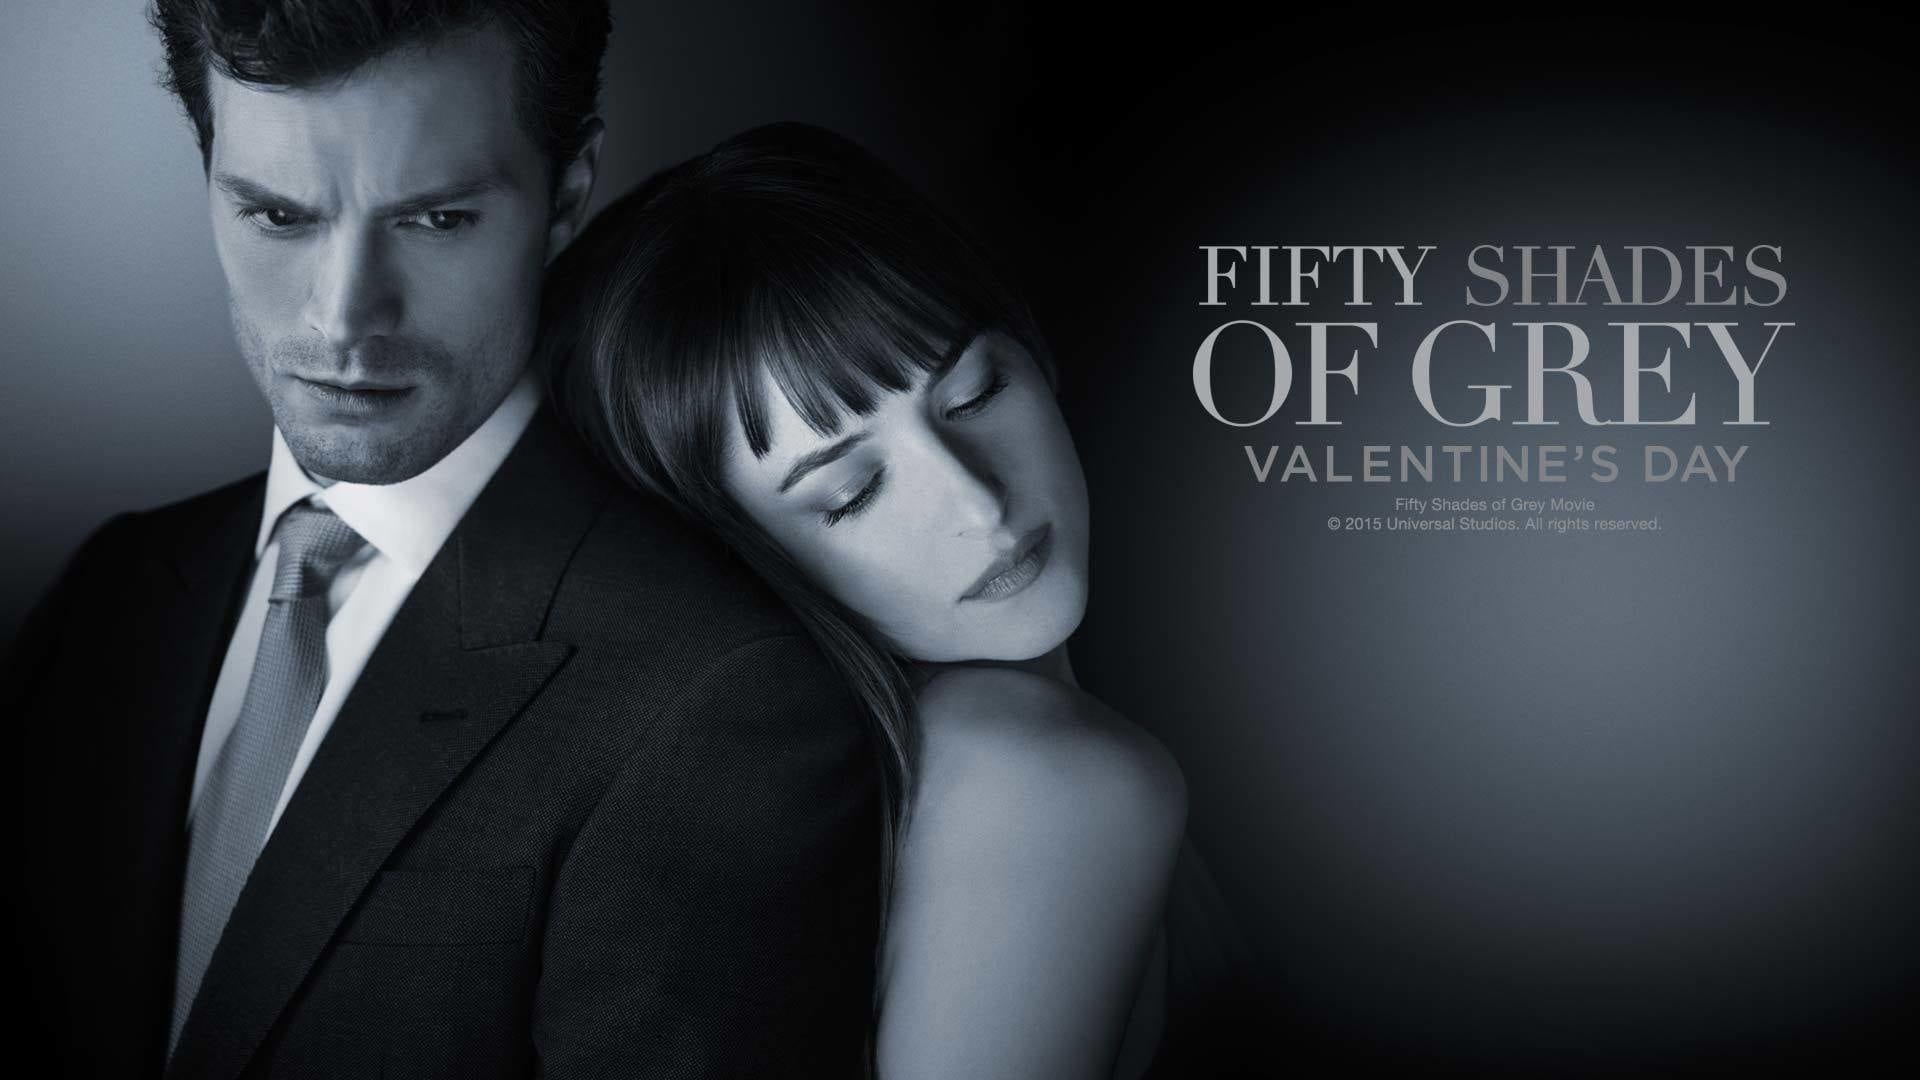 A Szurke Otven Arnyalata 2015 Putlocker Film Complet Streaming Anastasia Steele Egy Irodalo Shades Of Grey Movie Fifty Shades Of Grey Fifty Shades Darker